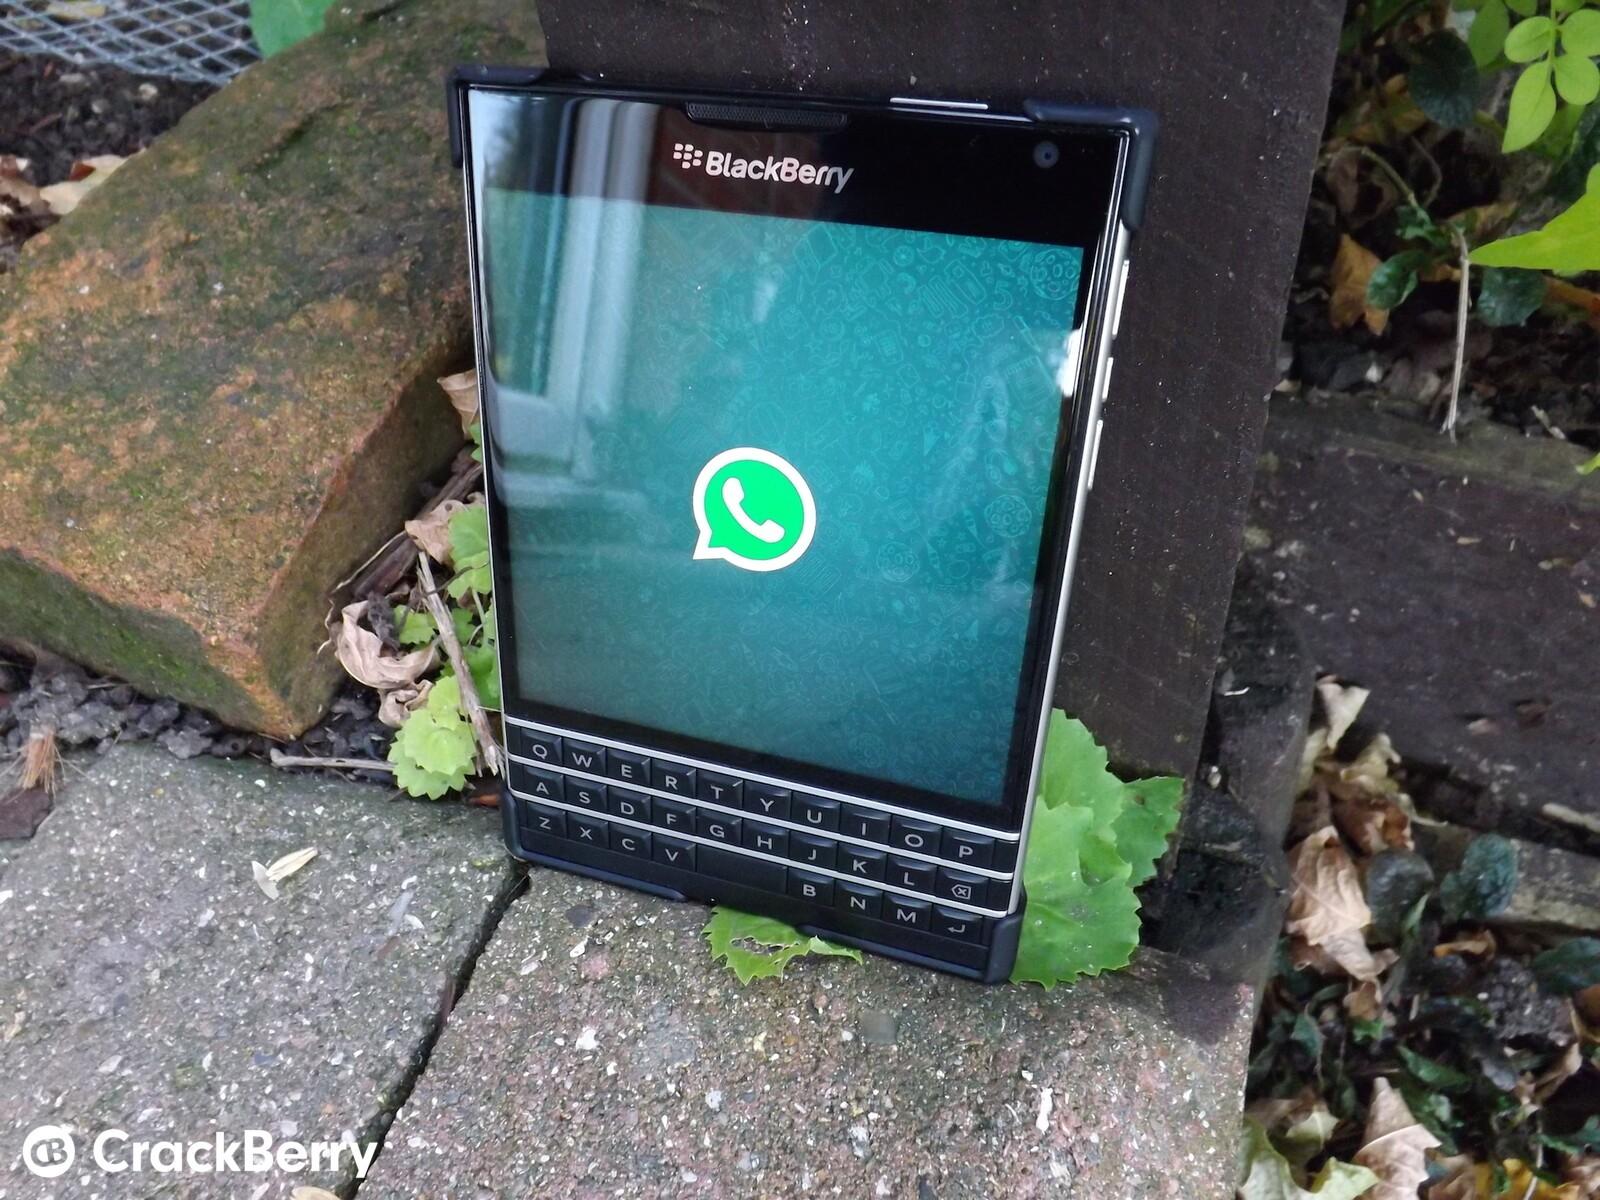 WhatsApp s updated for BlackBerry 10 3 and the Passport